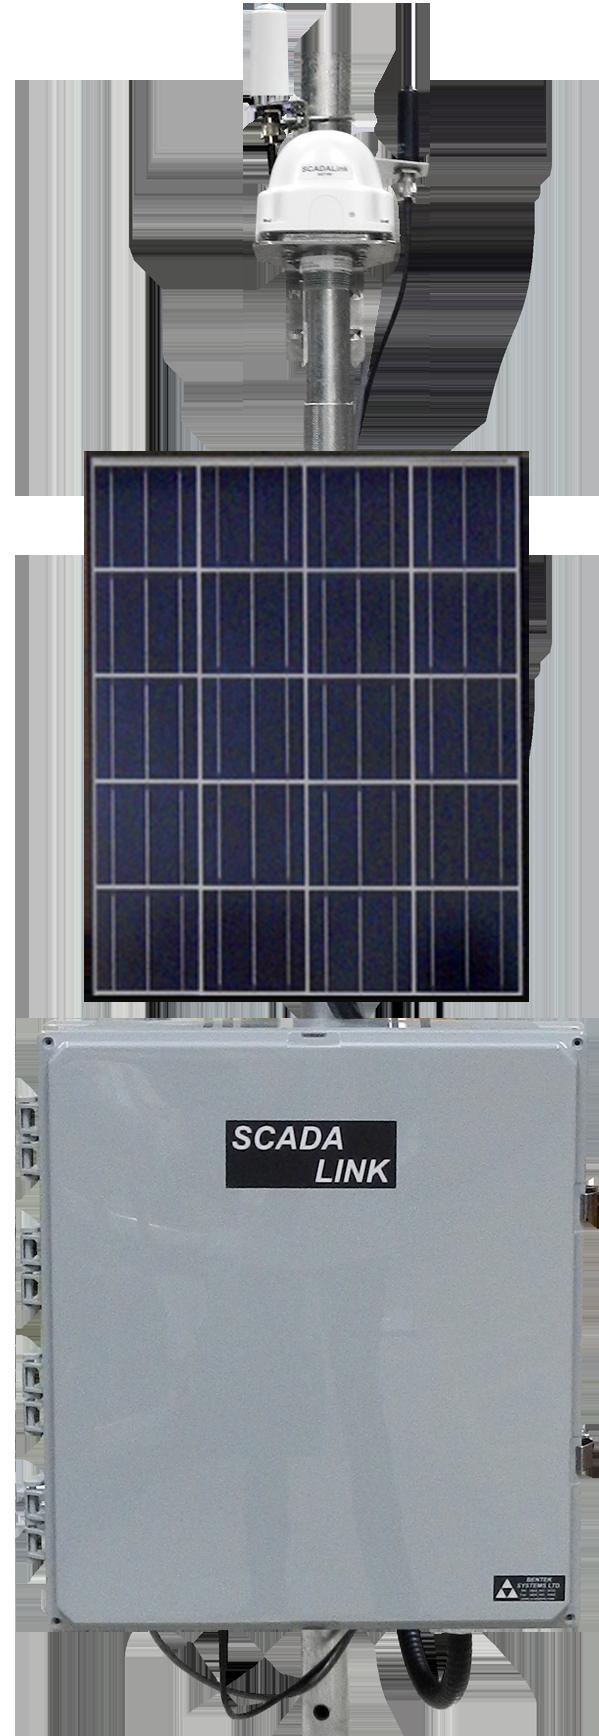 sat130-solar-rtu-sat-cell-wifi